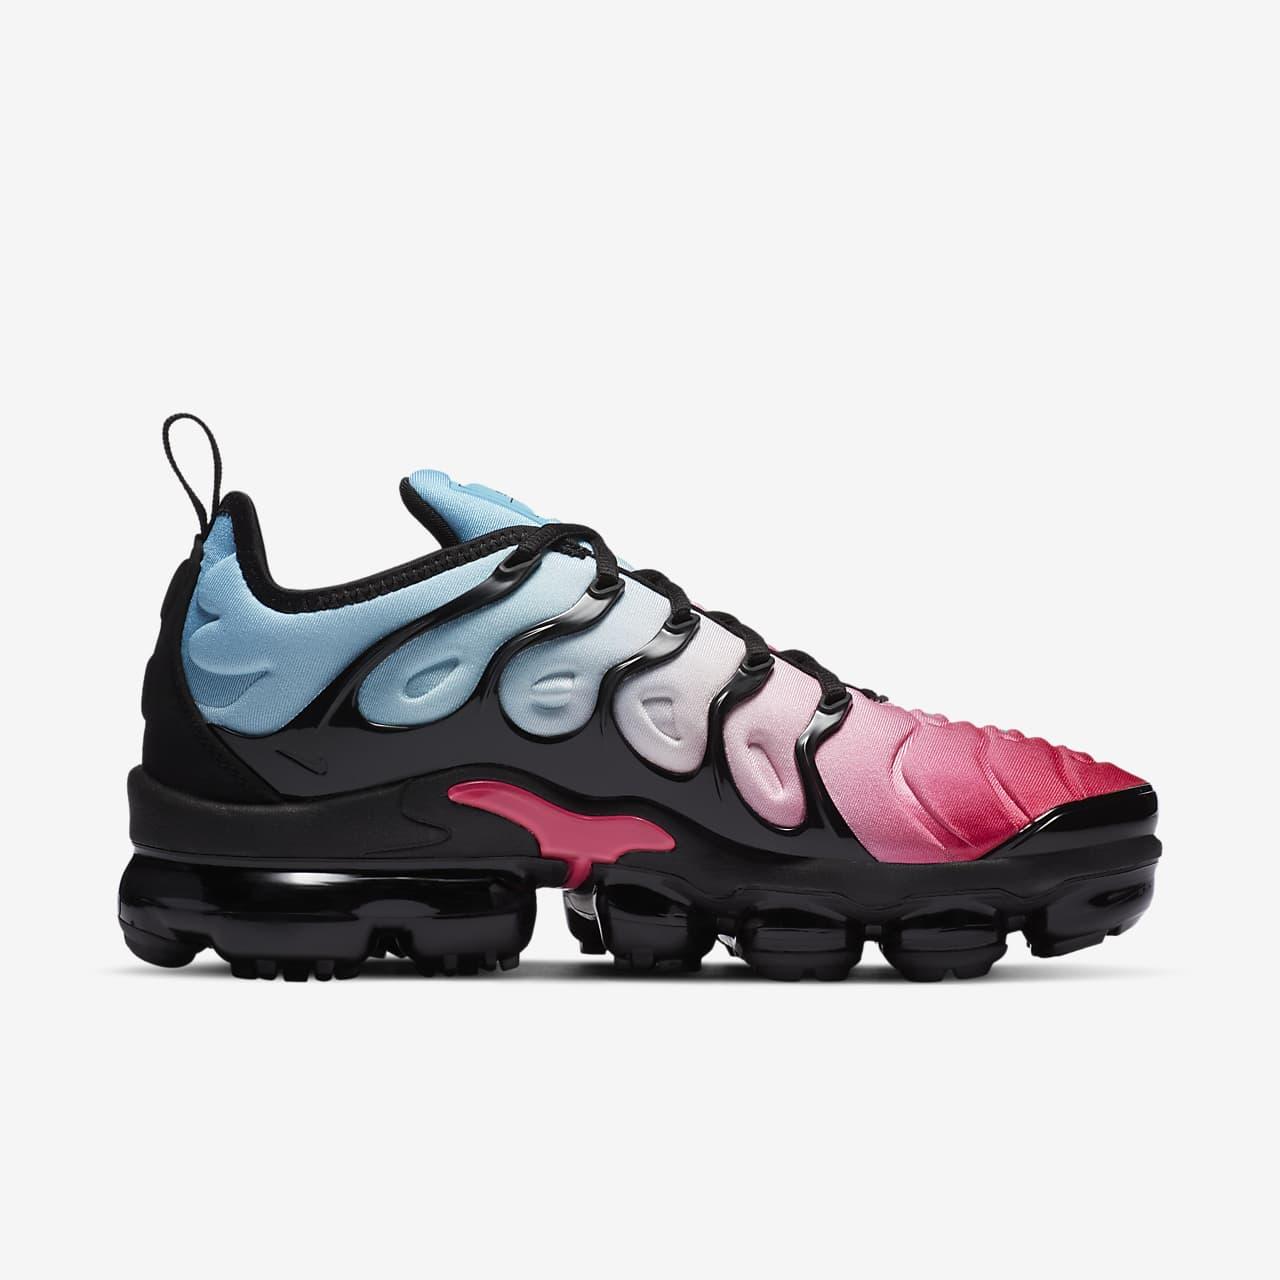 nike tn vapormax pink Shop Clothing & Shoes Online